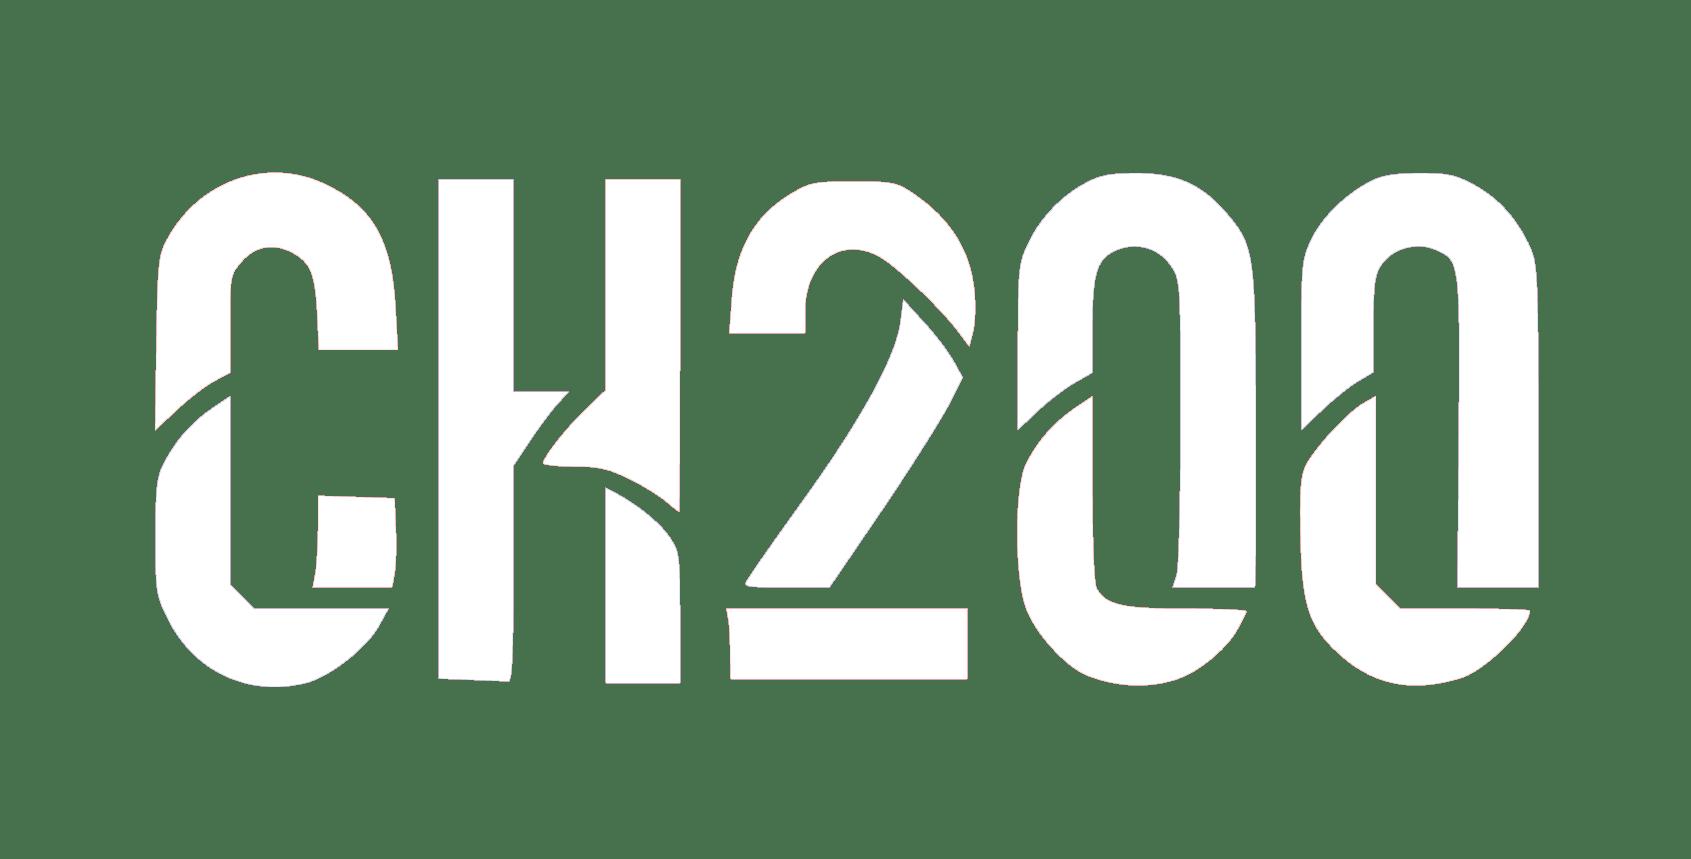 CH200